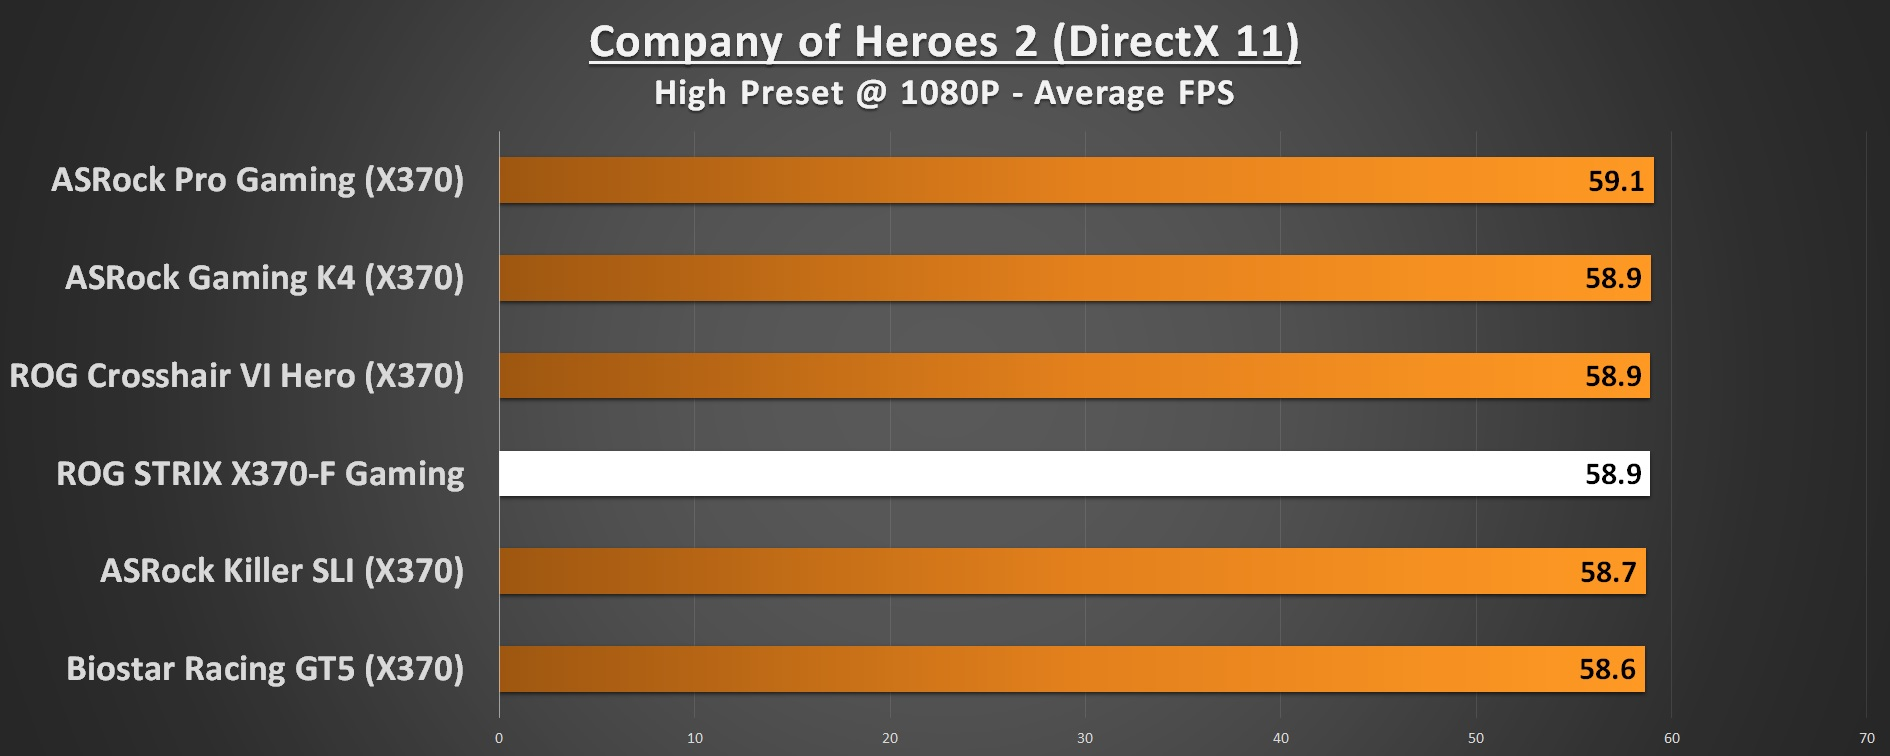 Company of Heroes 2 1080p